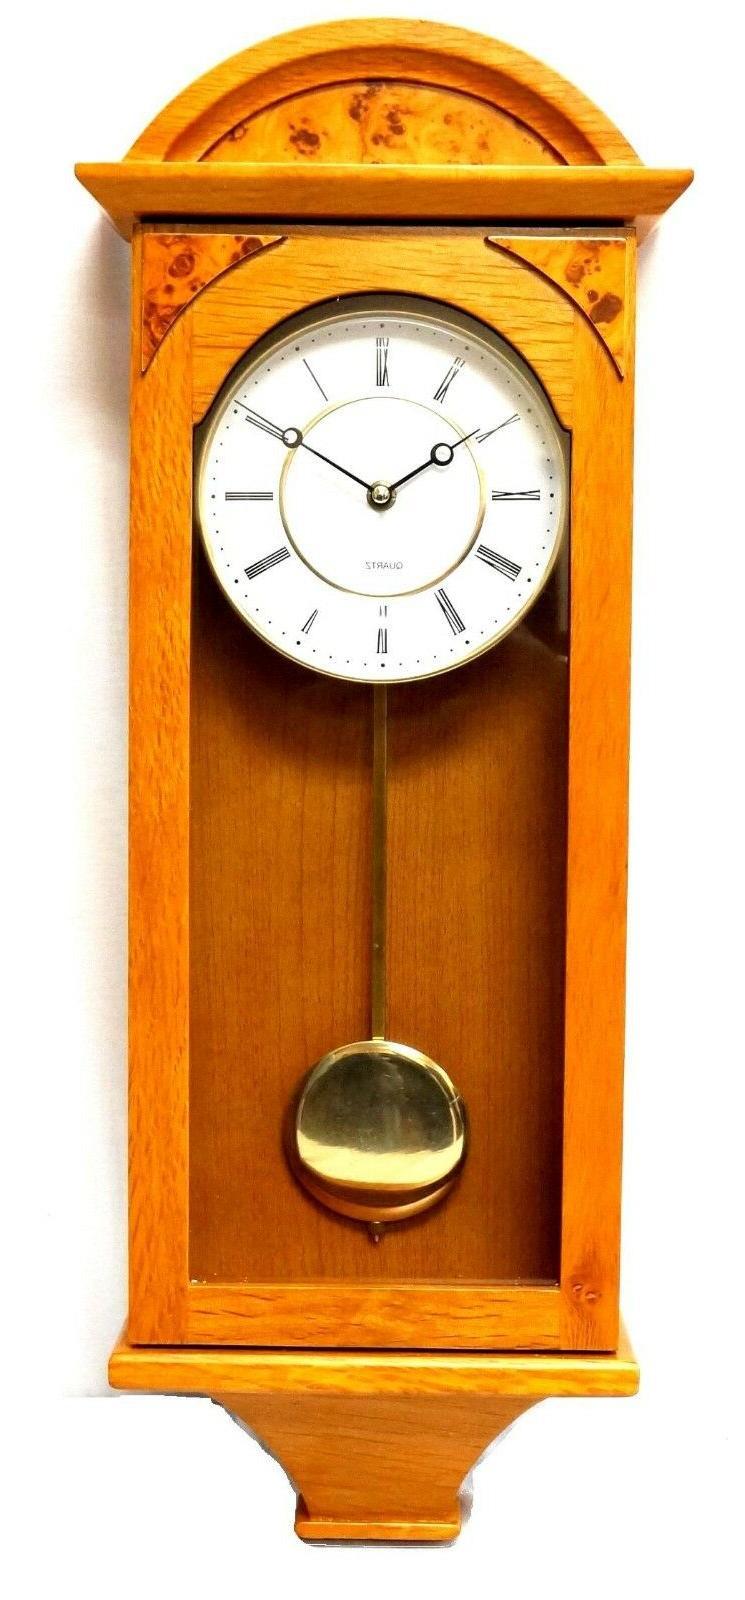 J&D Pendulum Wall Clock Silent classic Battery